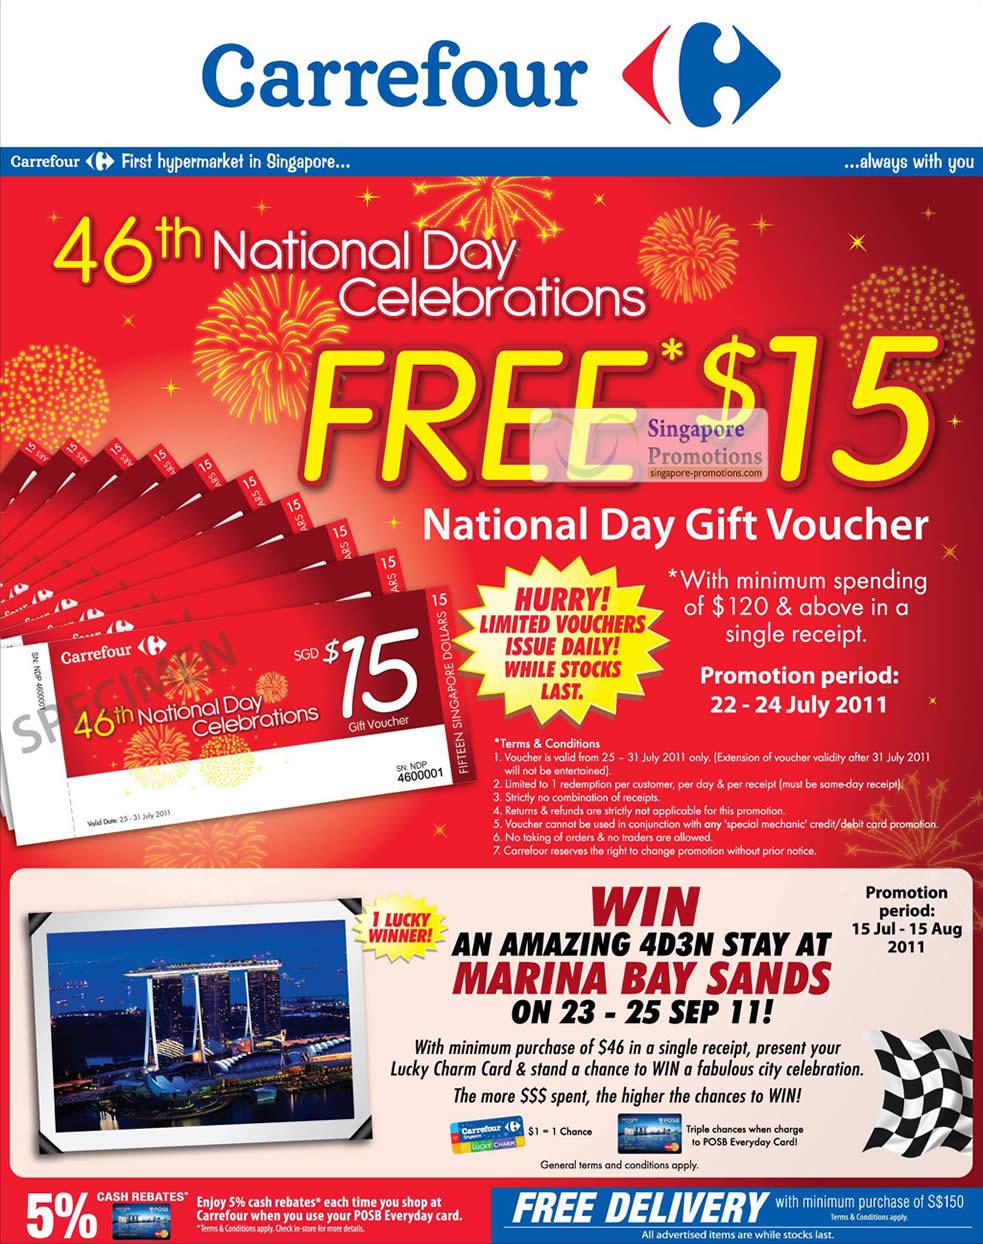 National Day Free 15 Dollar Voucher